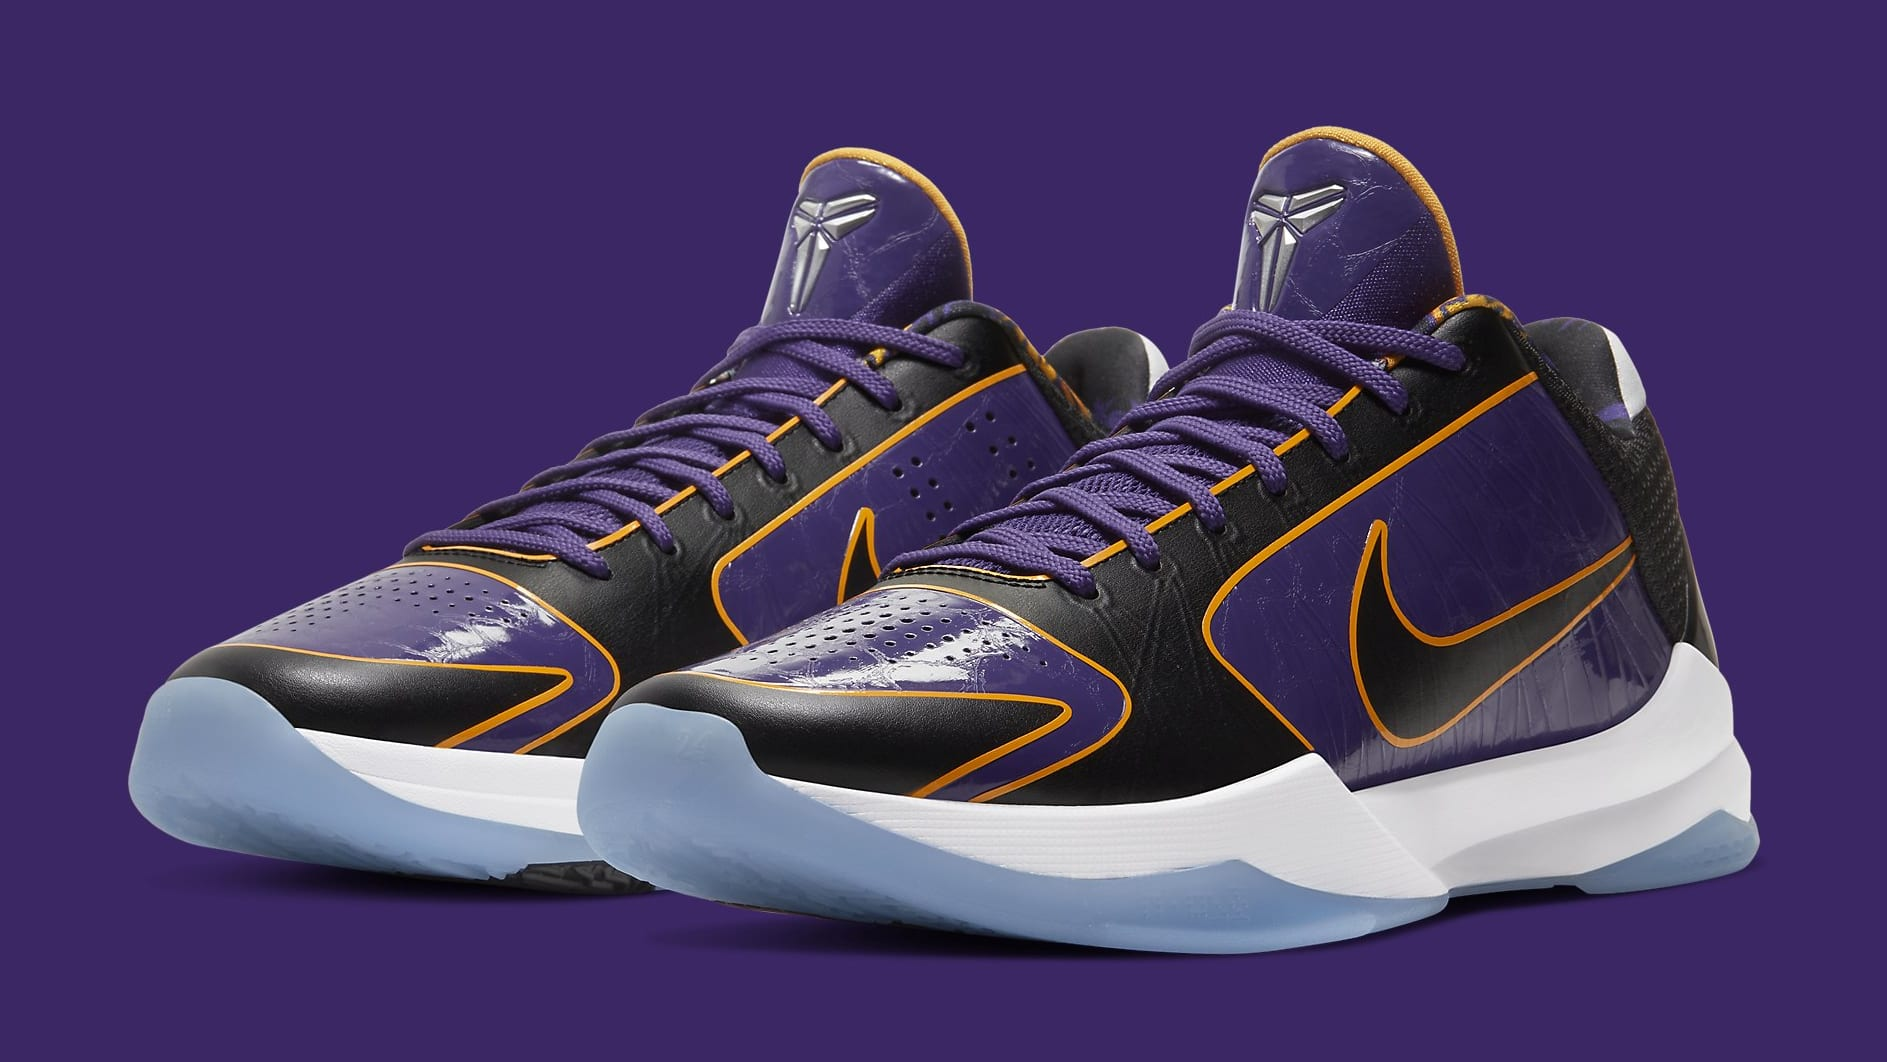 Nike Kobe 5 Protro Lakers Release Date CD4991-500 Pair